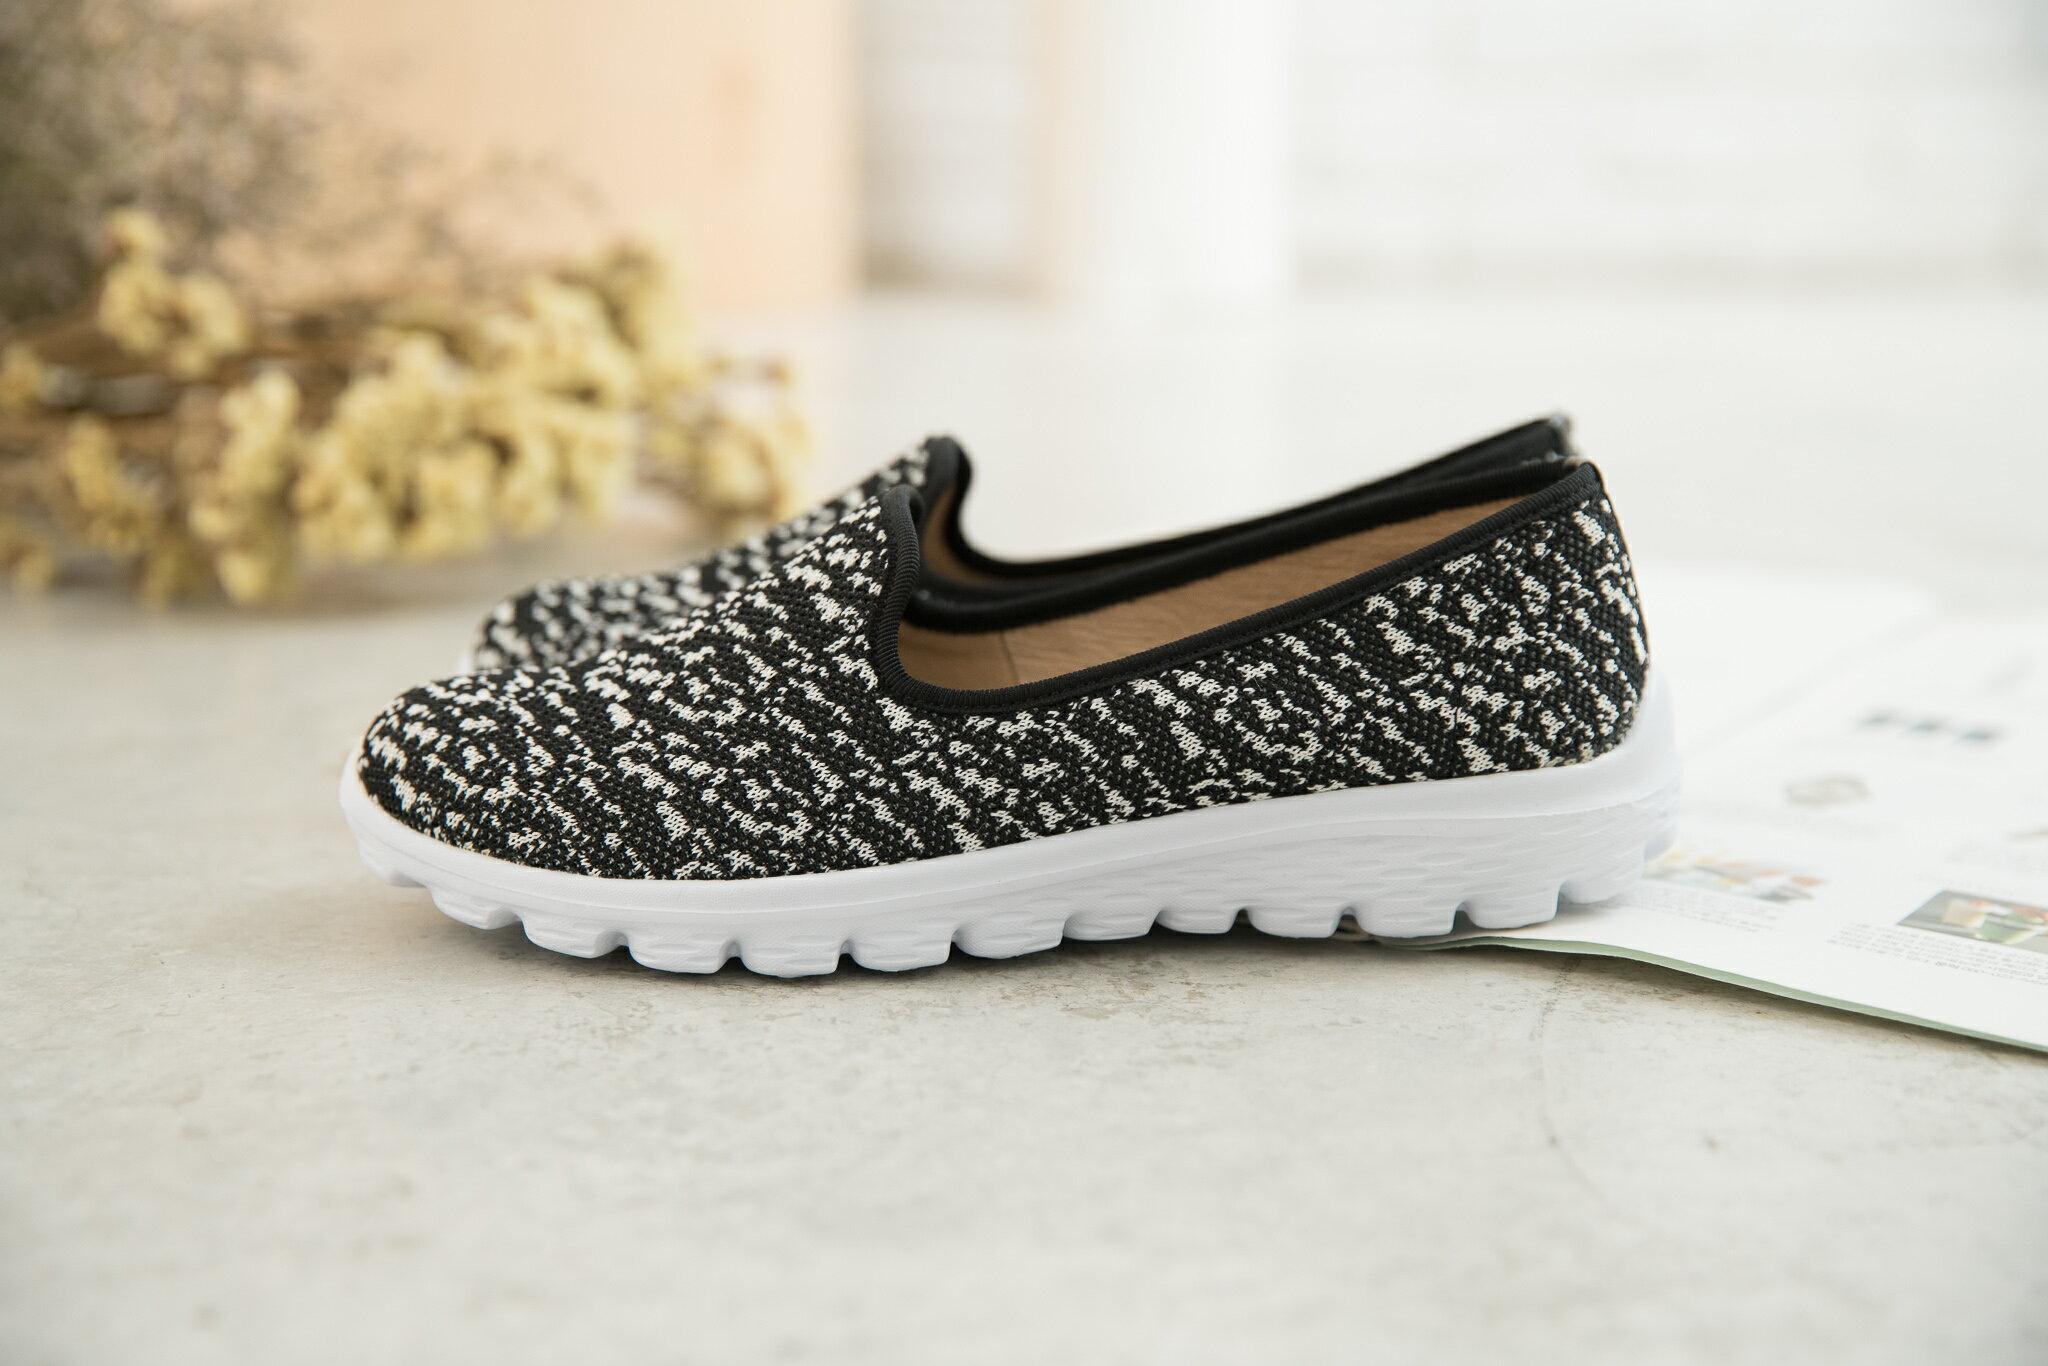 Aimez La Vie 輕盈健走鞋|黑白織布混色百搭休閒鞋 1